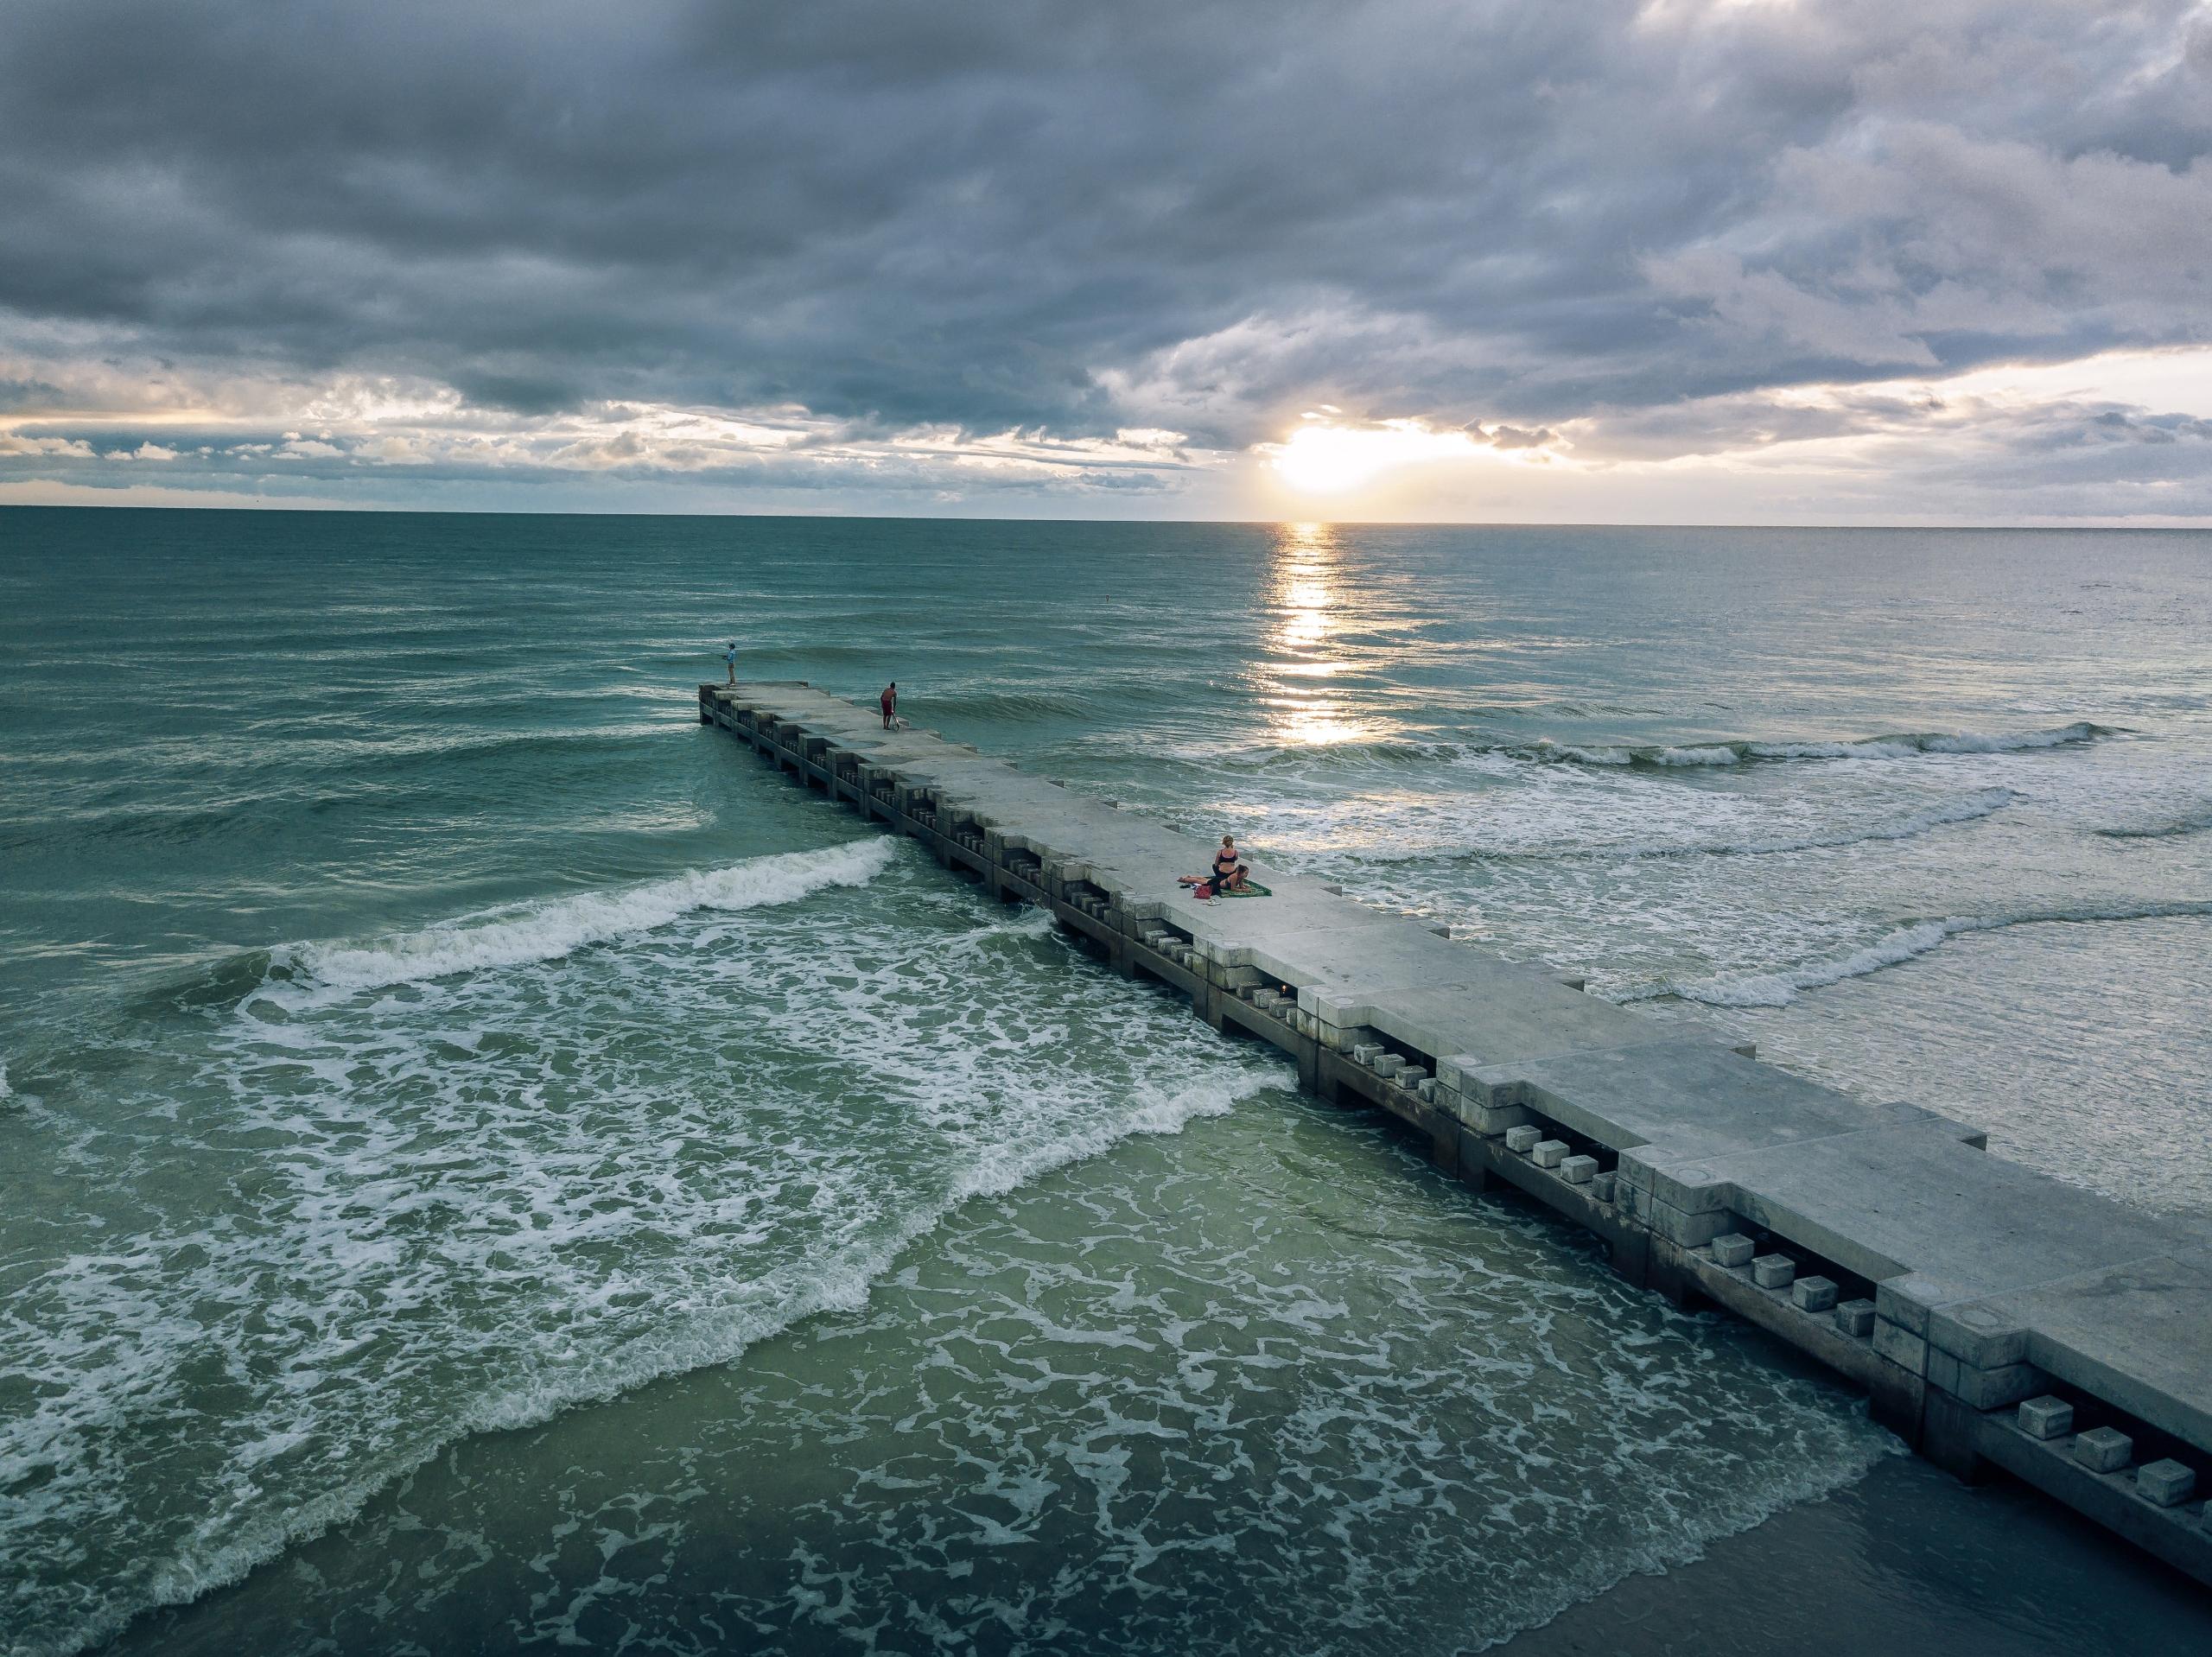 Cloud Cover leave blog - beach, BradentonBeach - rickschwartz | ello